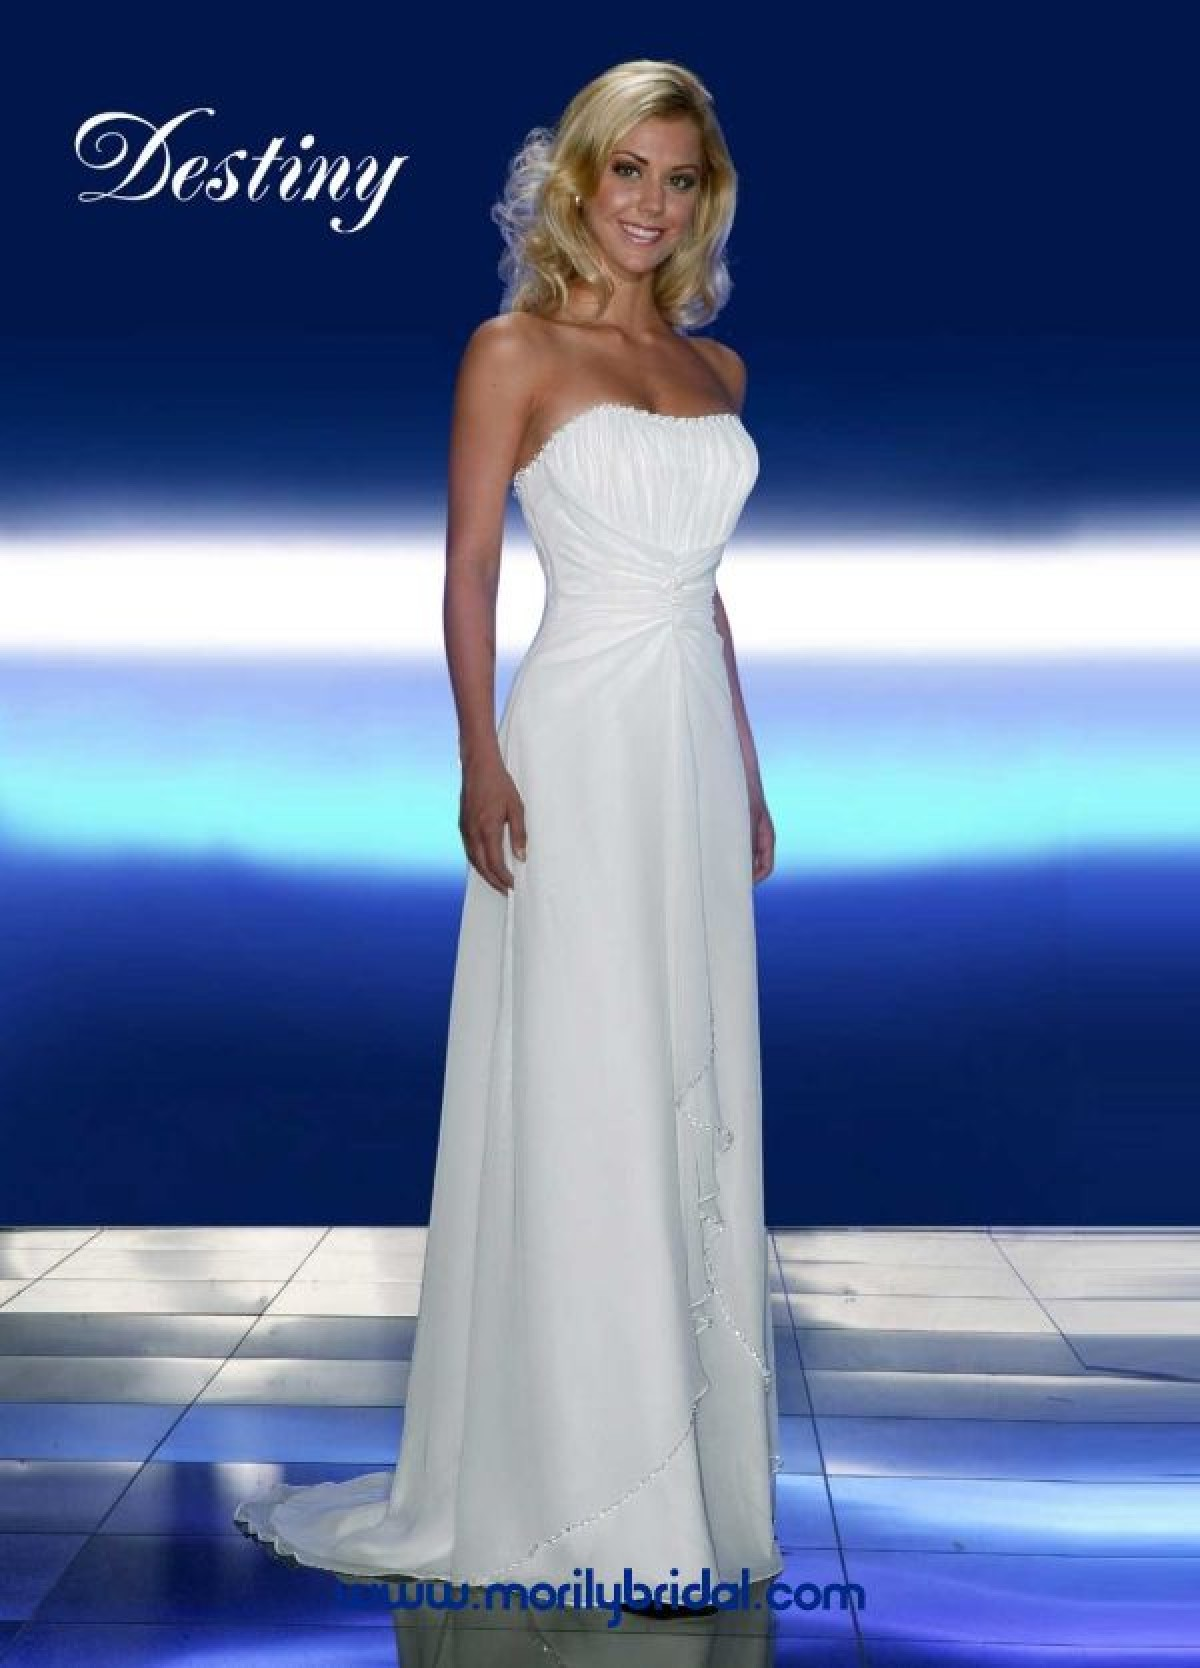 Destiny Impression Bridal | Bargain Bridal Gown